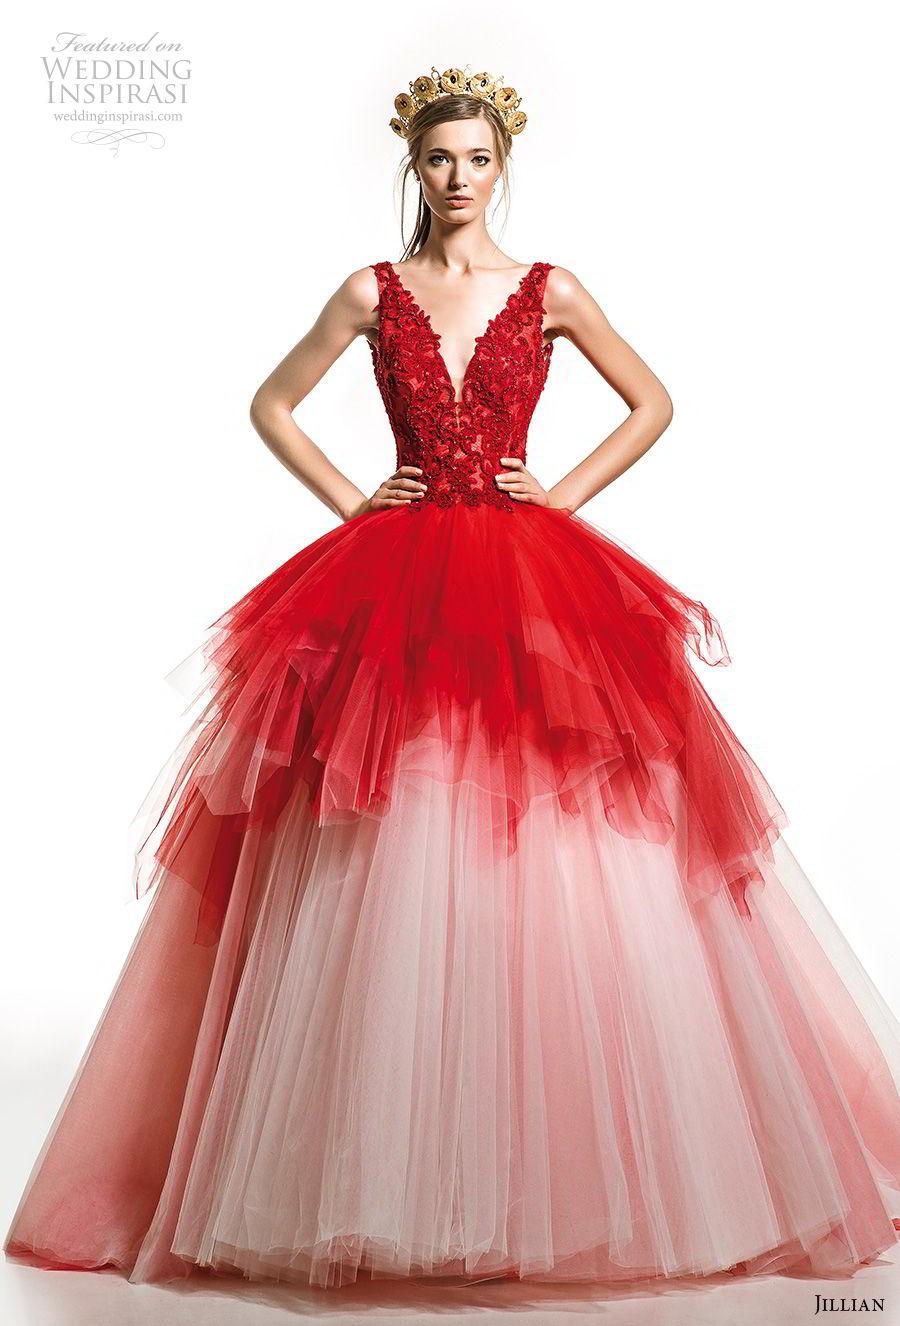 jillian 2019 bridal sleeveless deep v neck heavily embellished bodice tiered skirt red ball gown wedding dress v back chapel train (21) mv